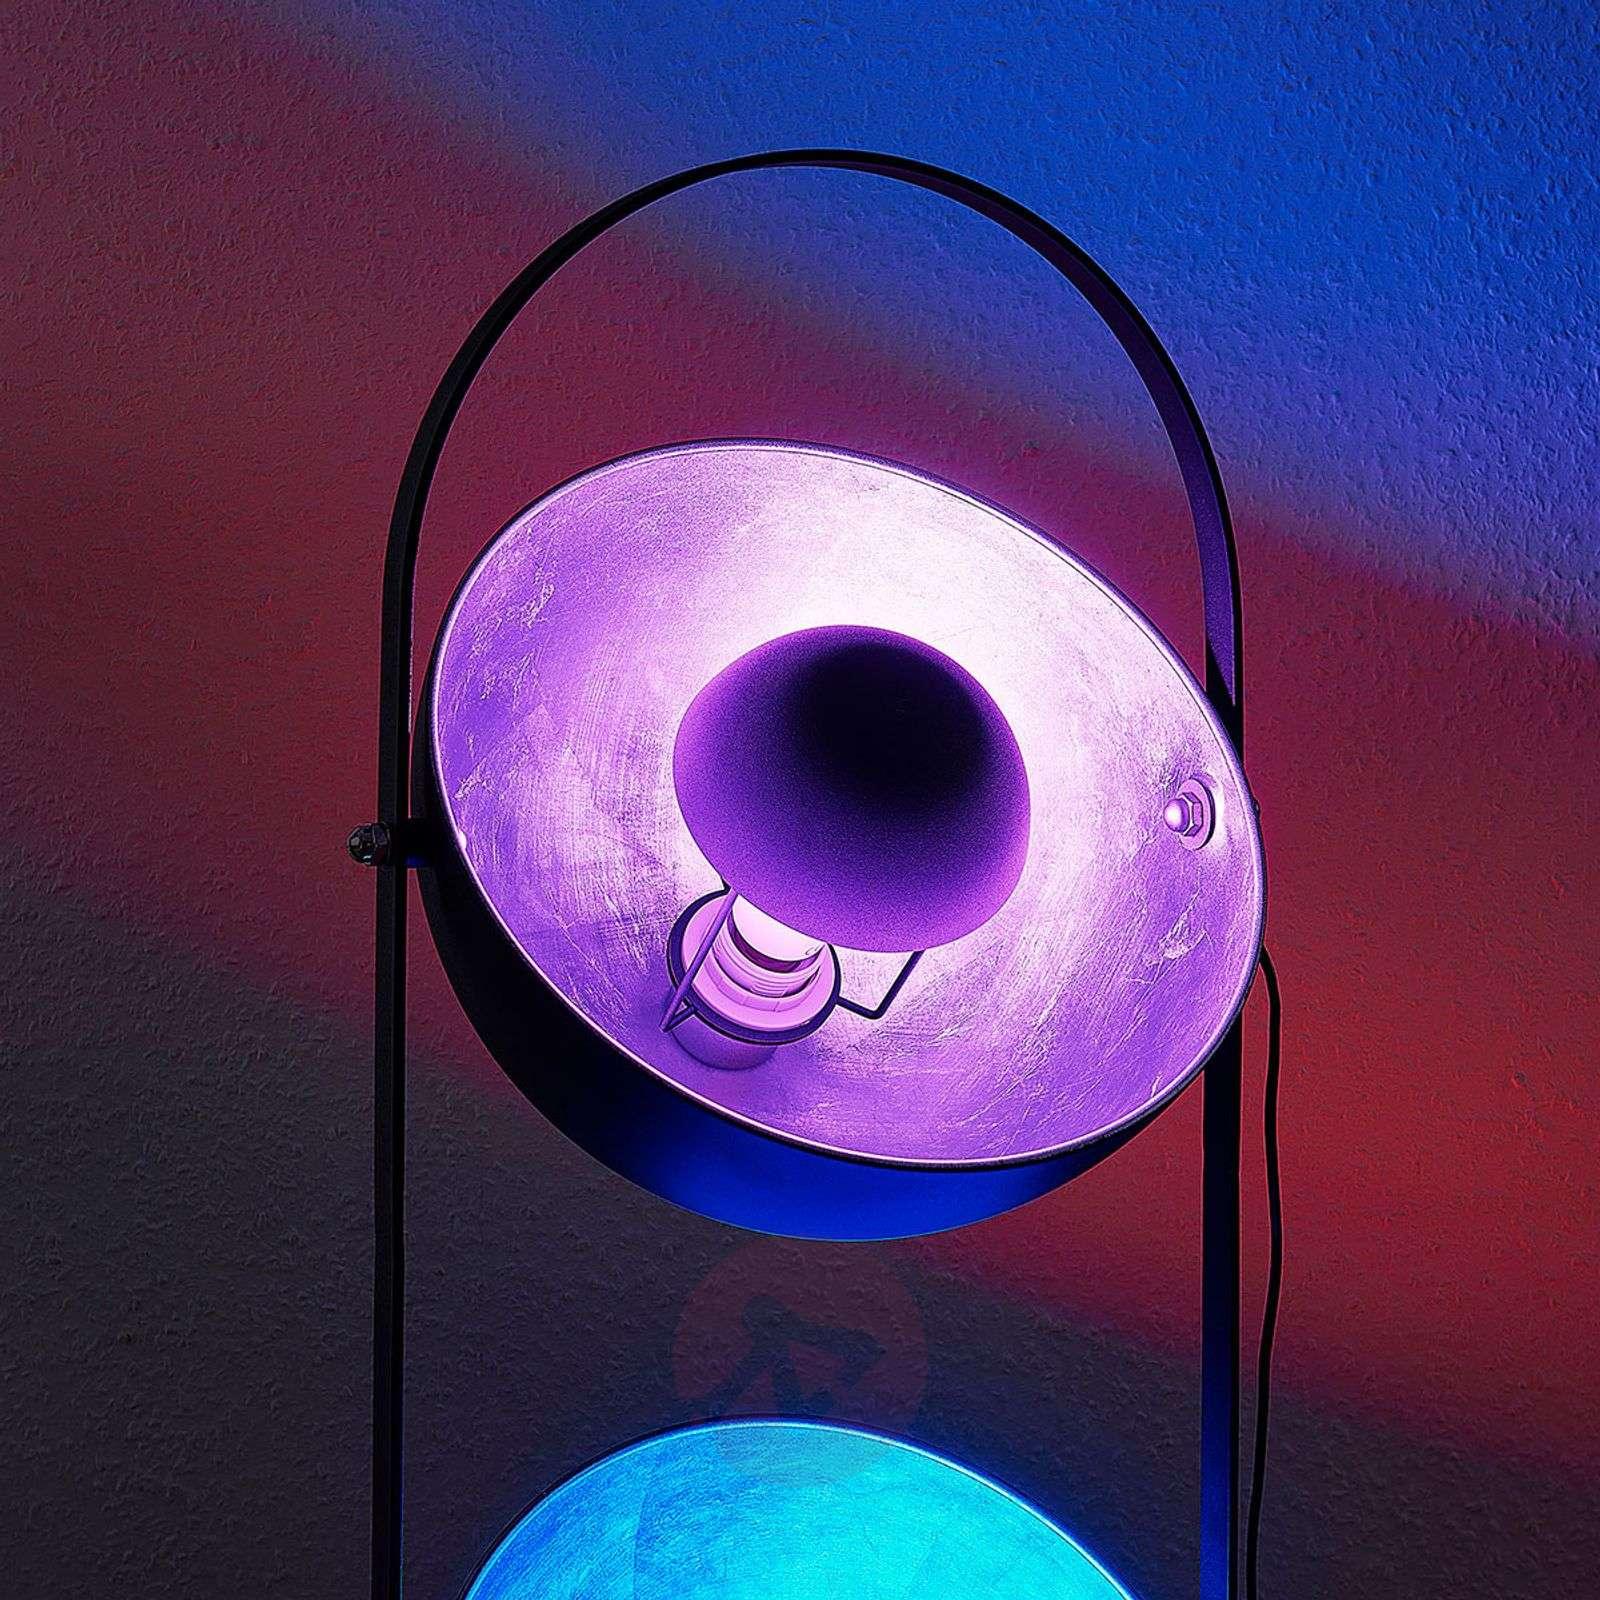 Lindby Smart LED-pöytävalaisin Muriel 3-lamp hopea-9624227-03